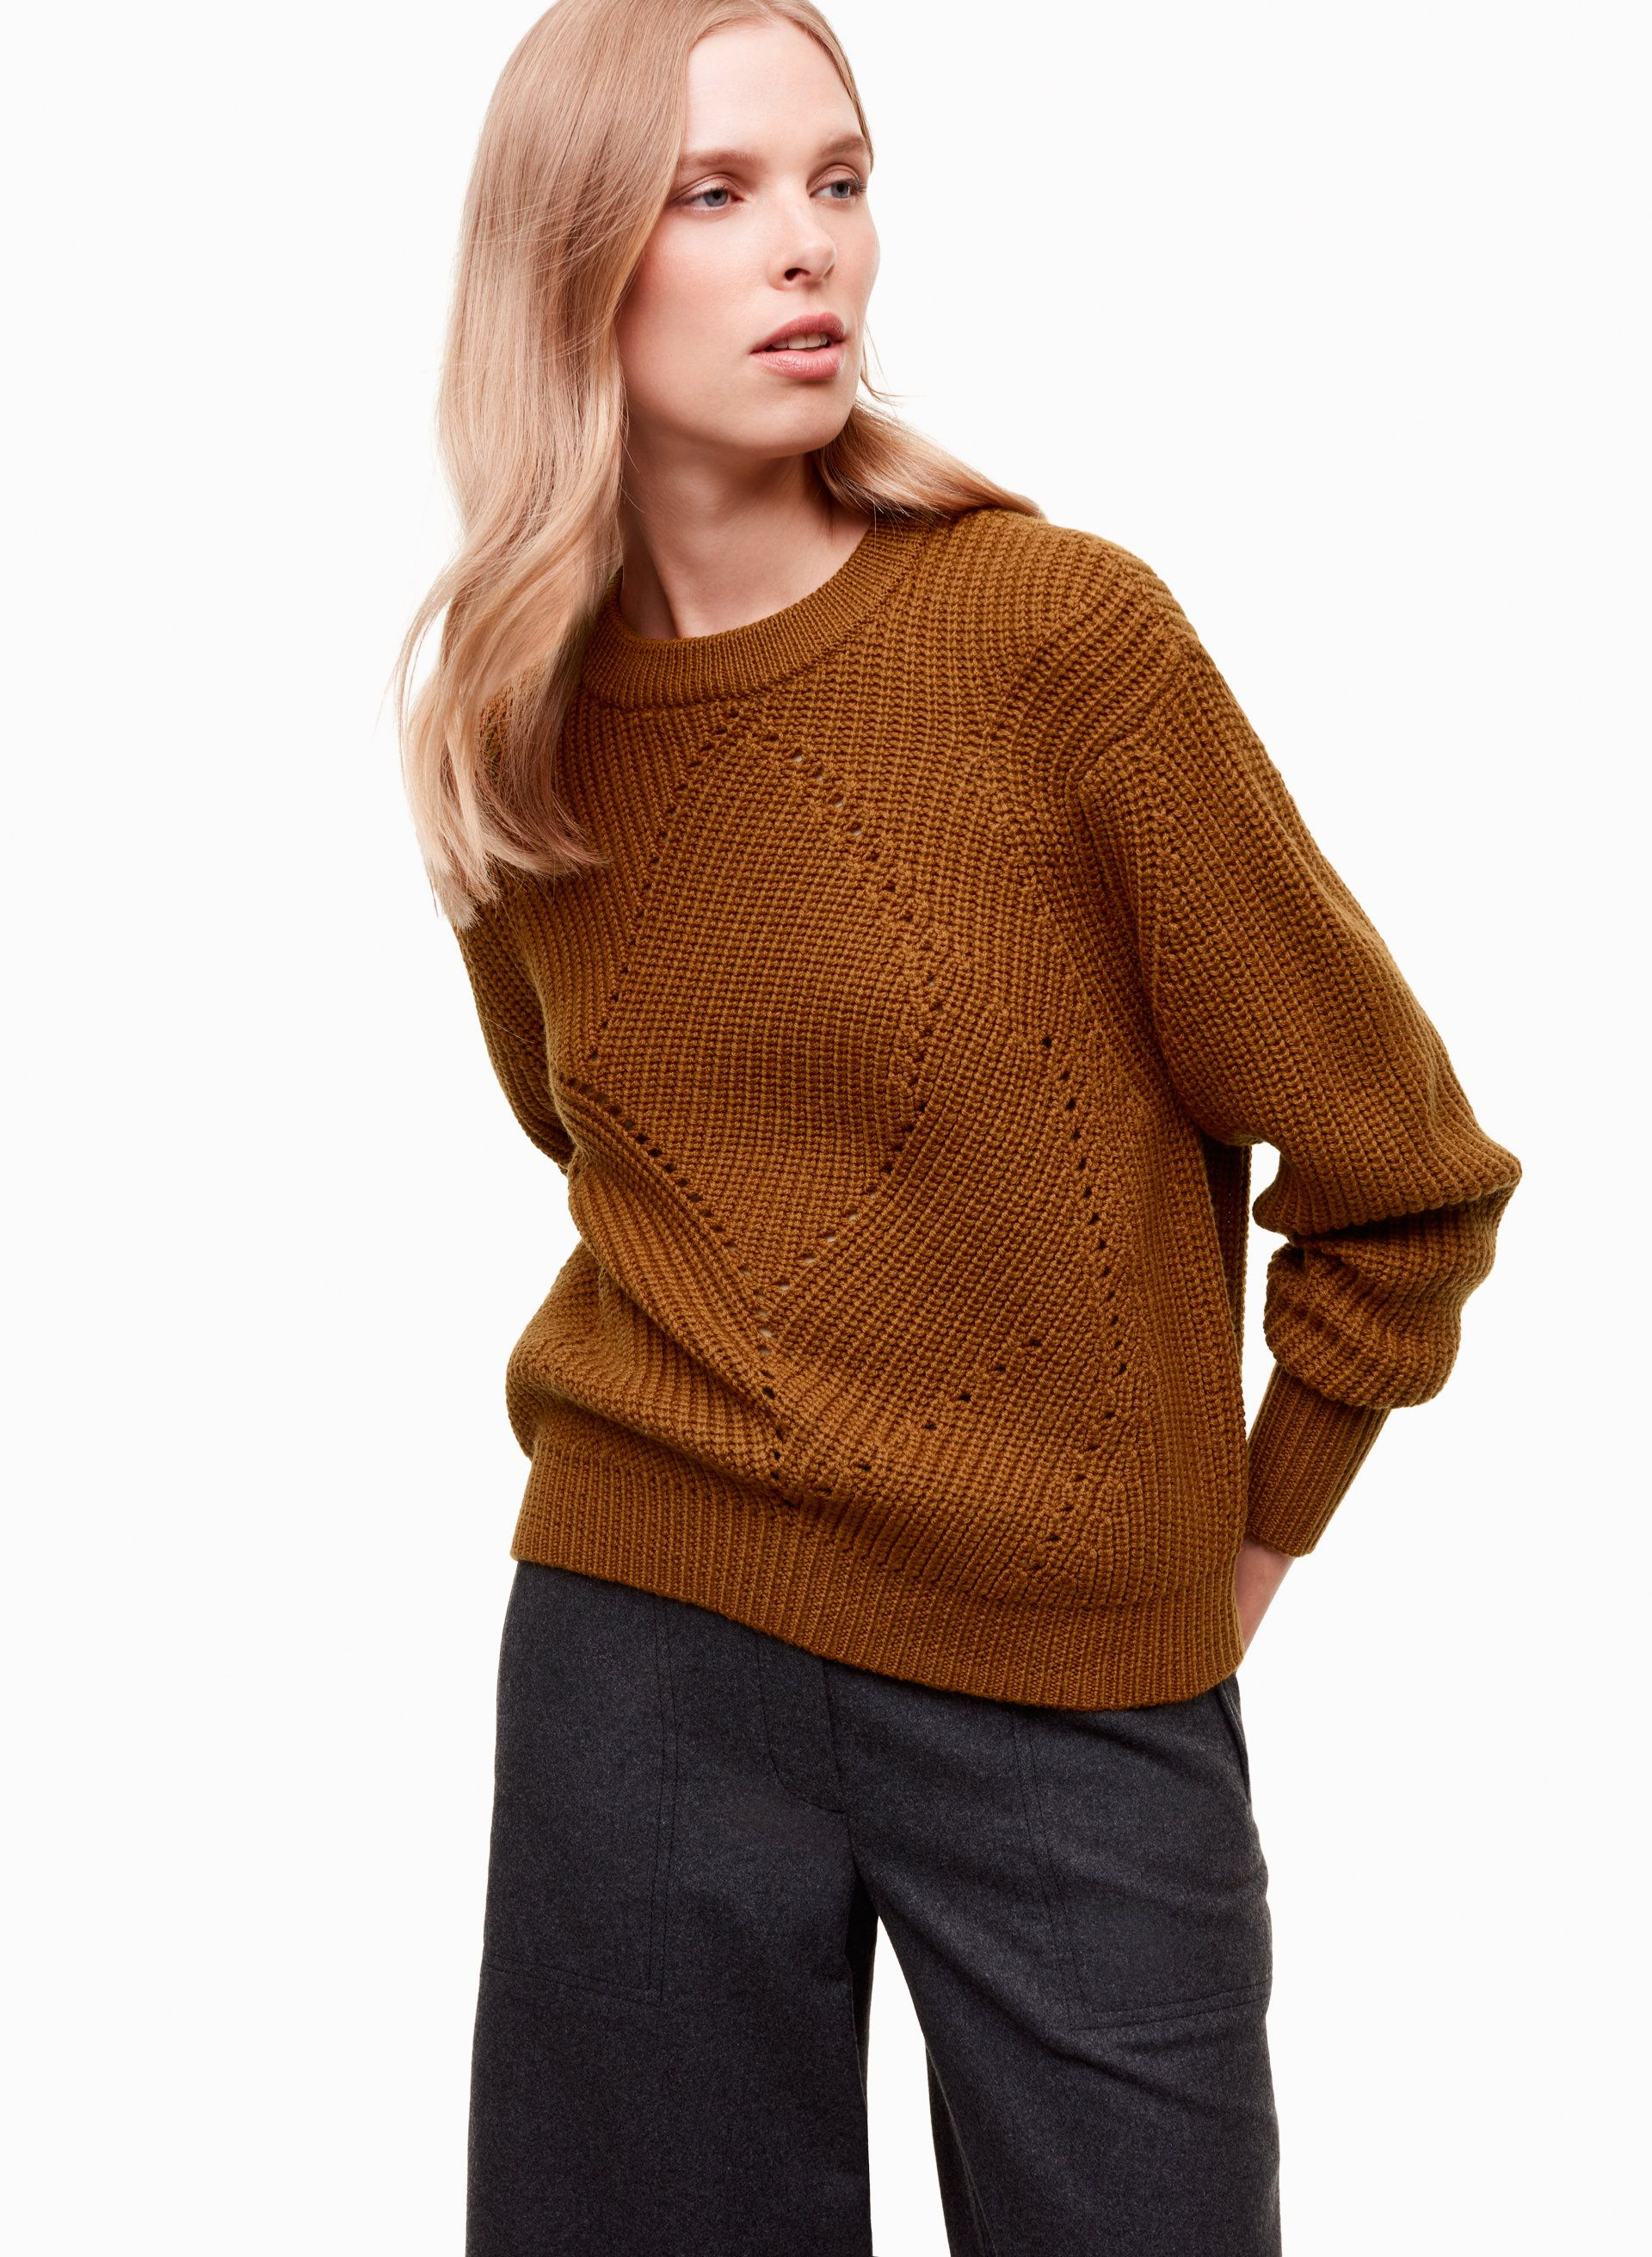 7f0a7b5374d9d Sweaters for Women. Wilfred SERMENT SWEATER